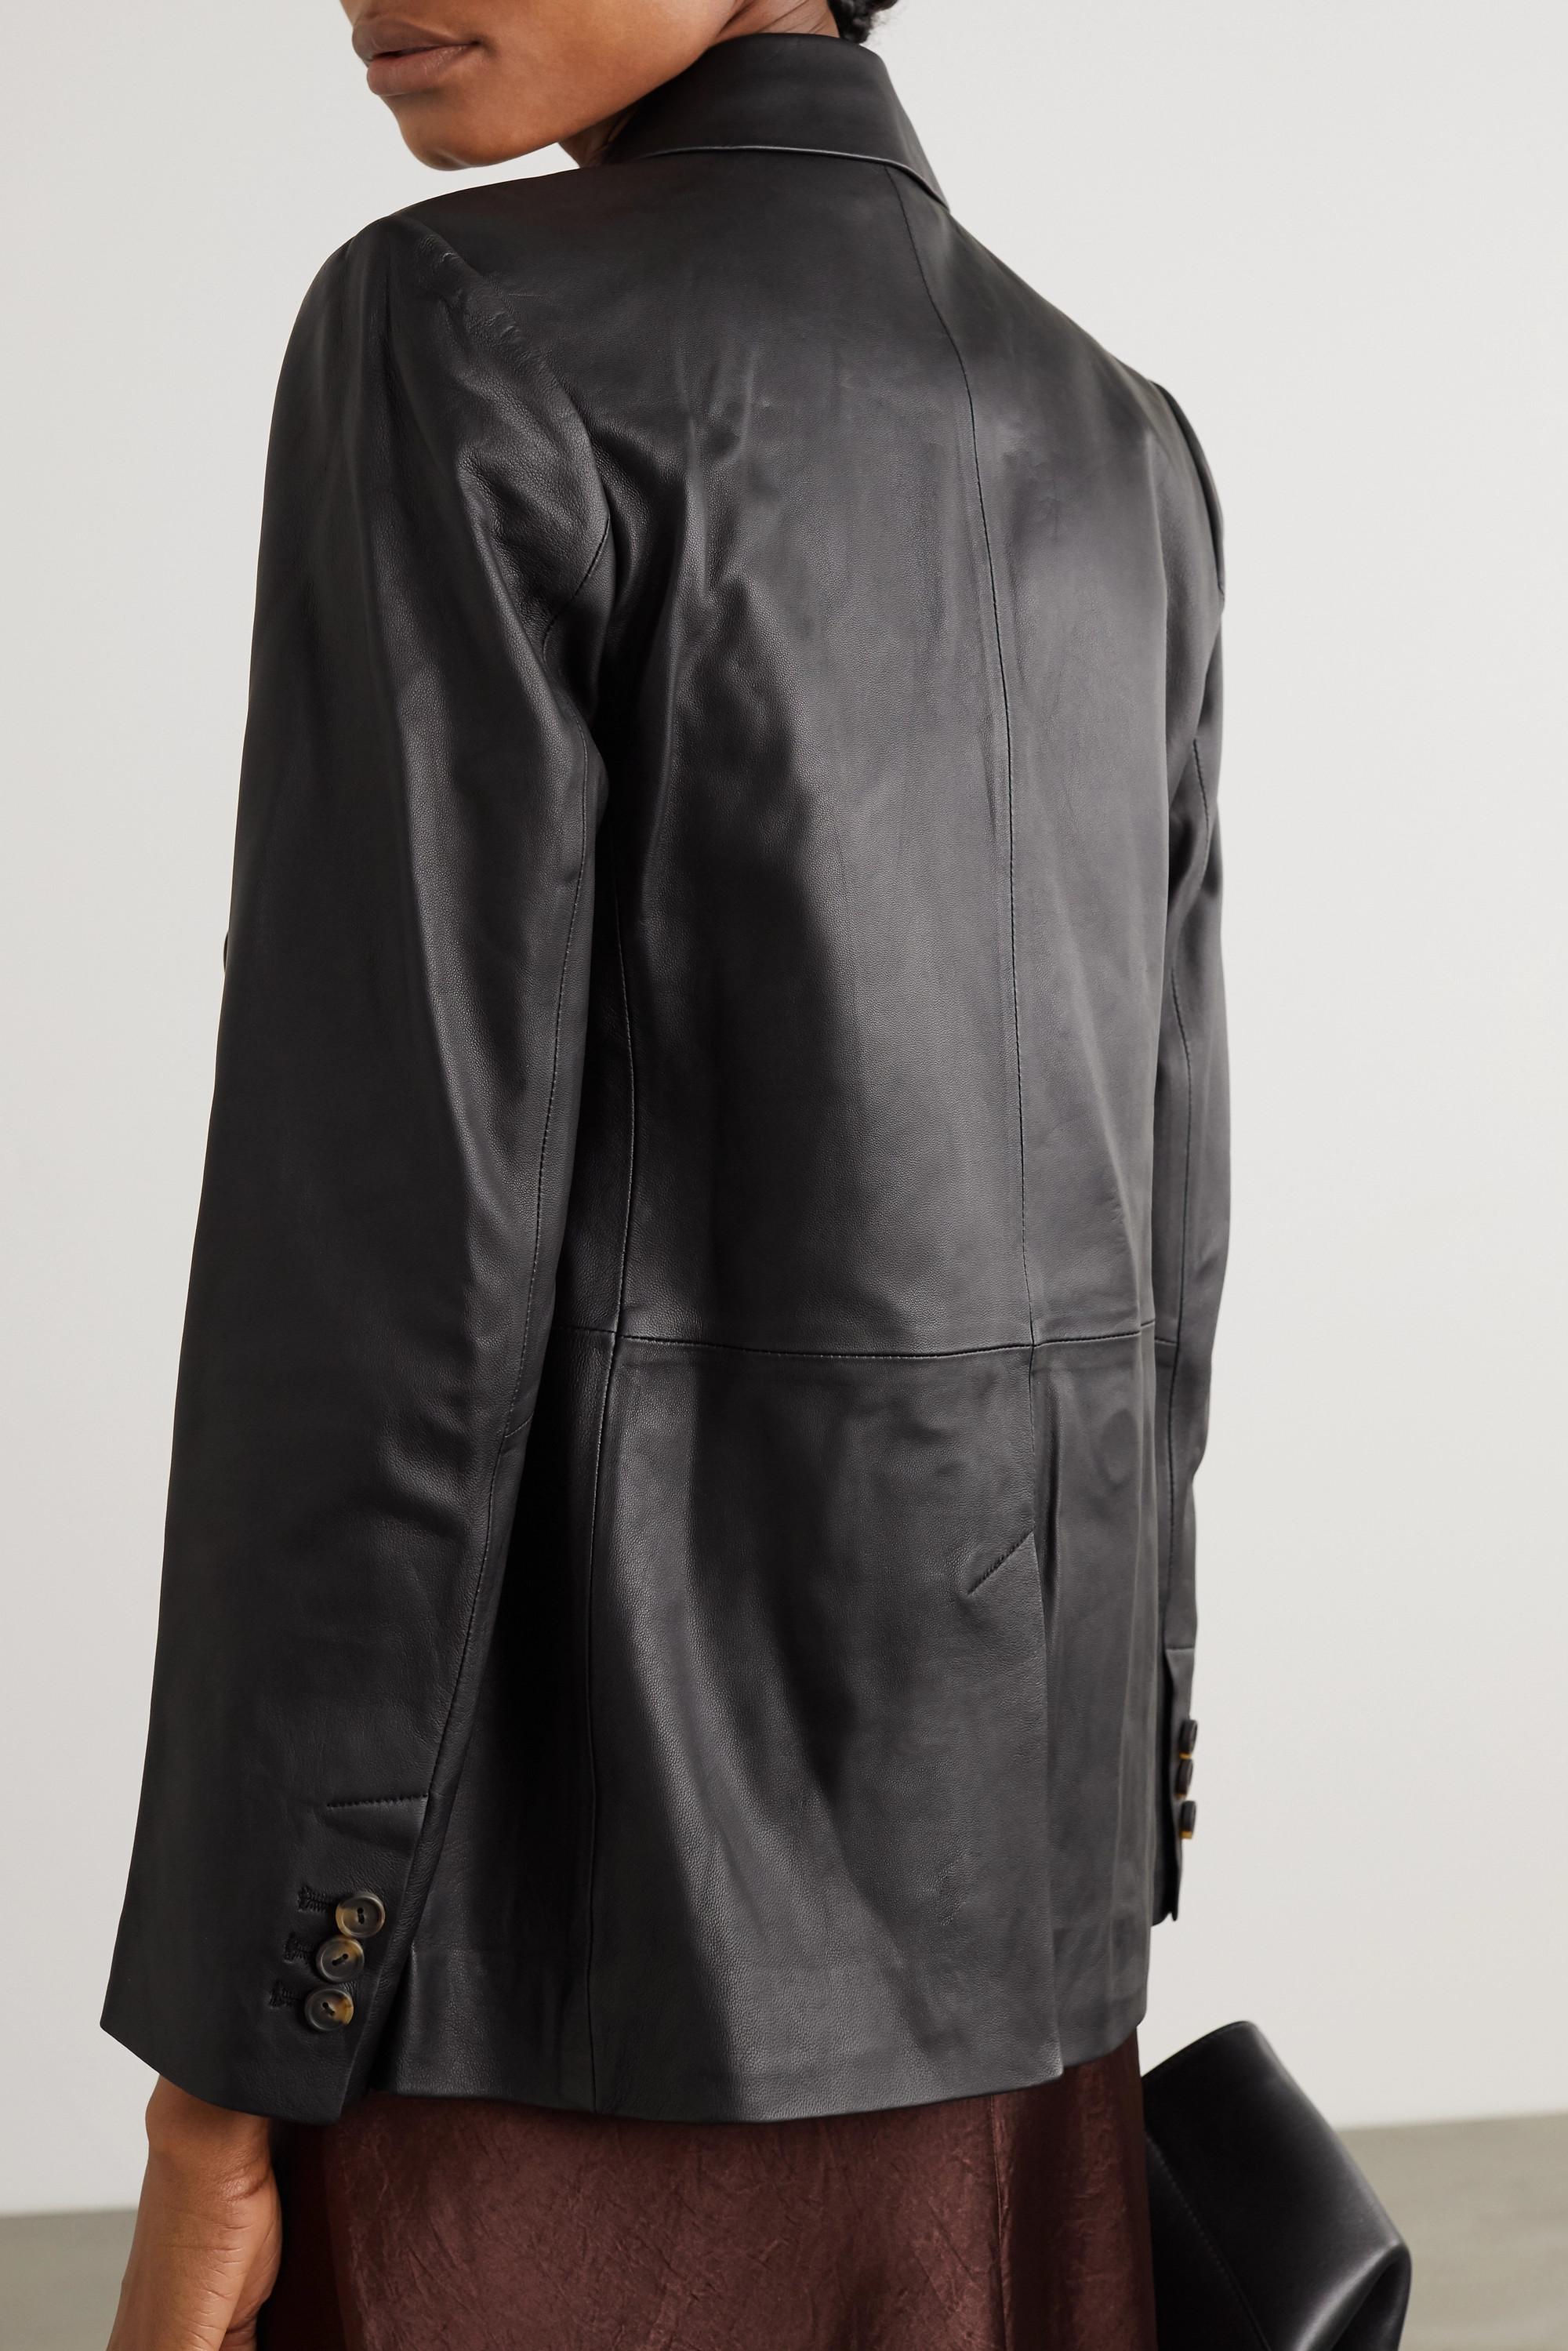 Vince 双排扣皮革西装外套